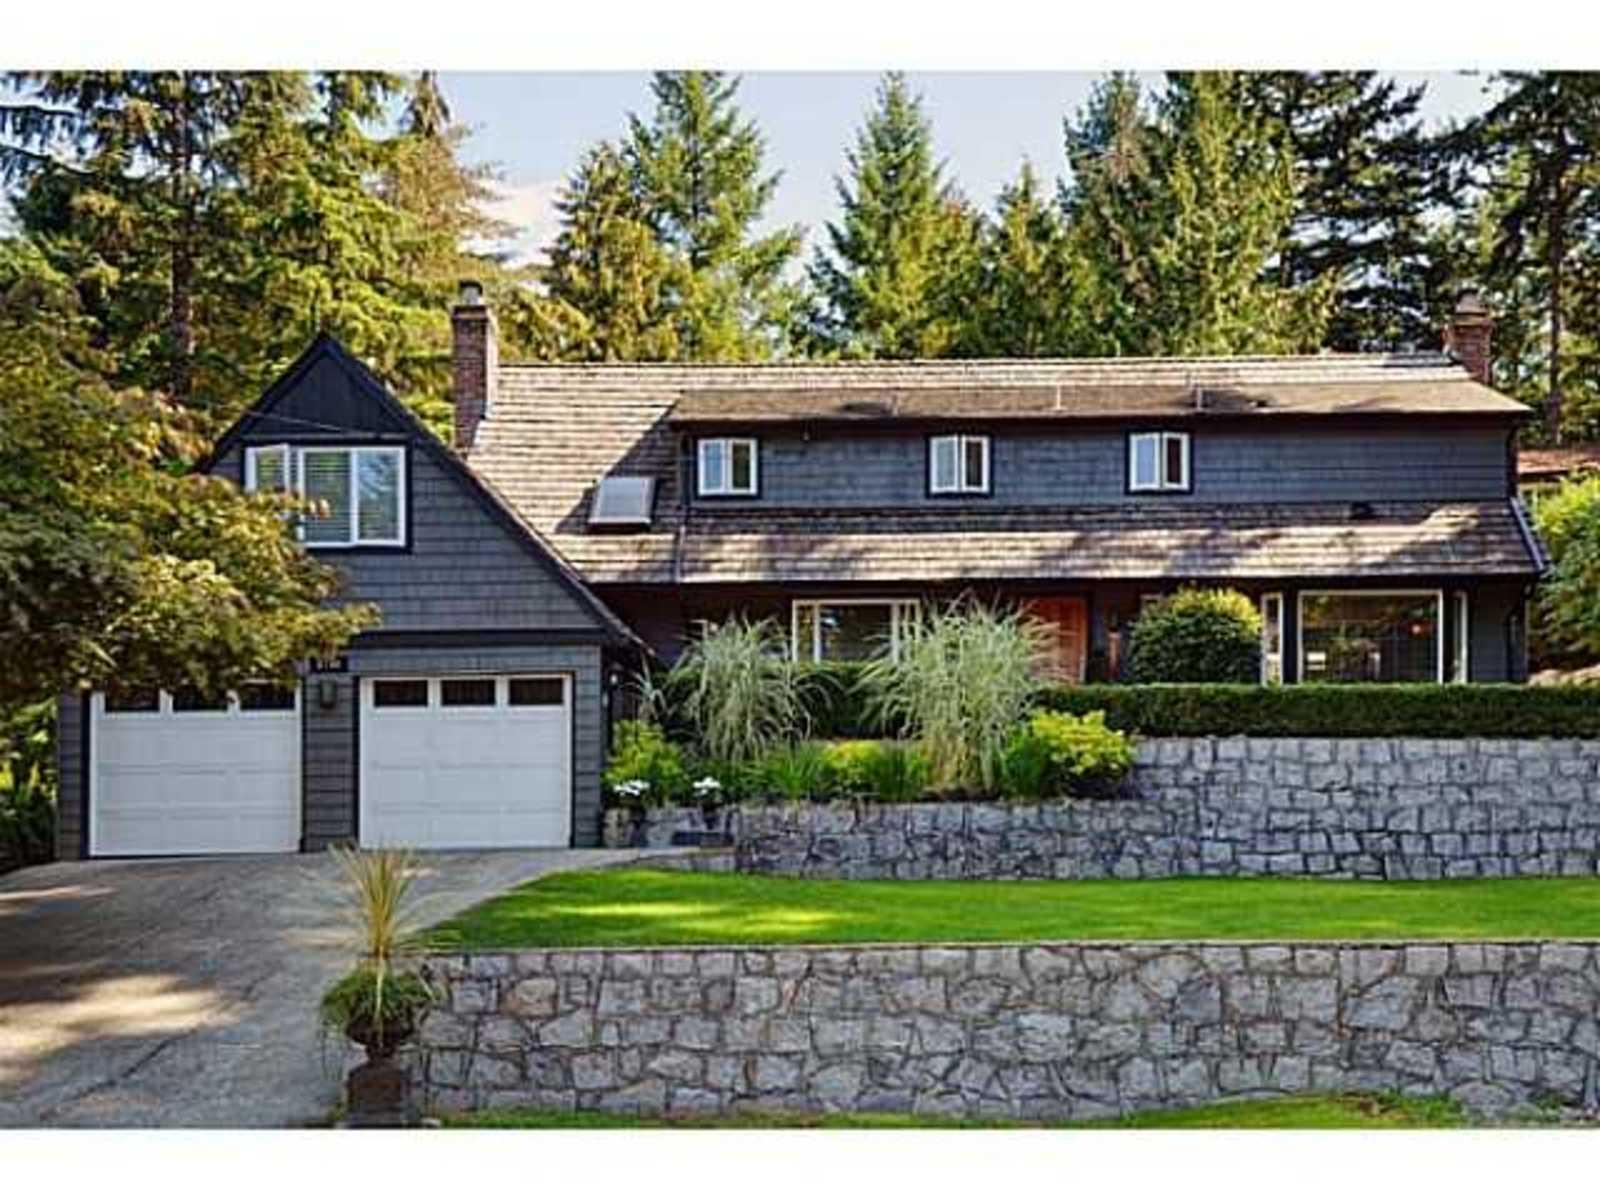 image-261575734-1.jpg at 3760 Bayridge Ave, Bayridge, West Vancouver